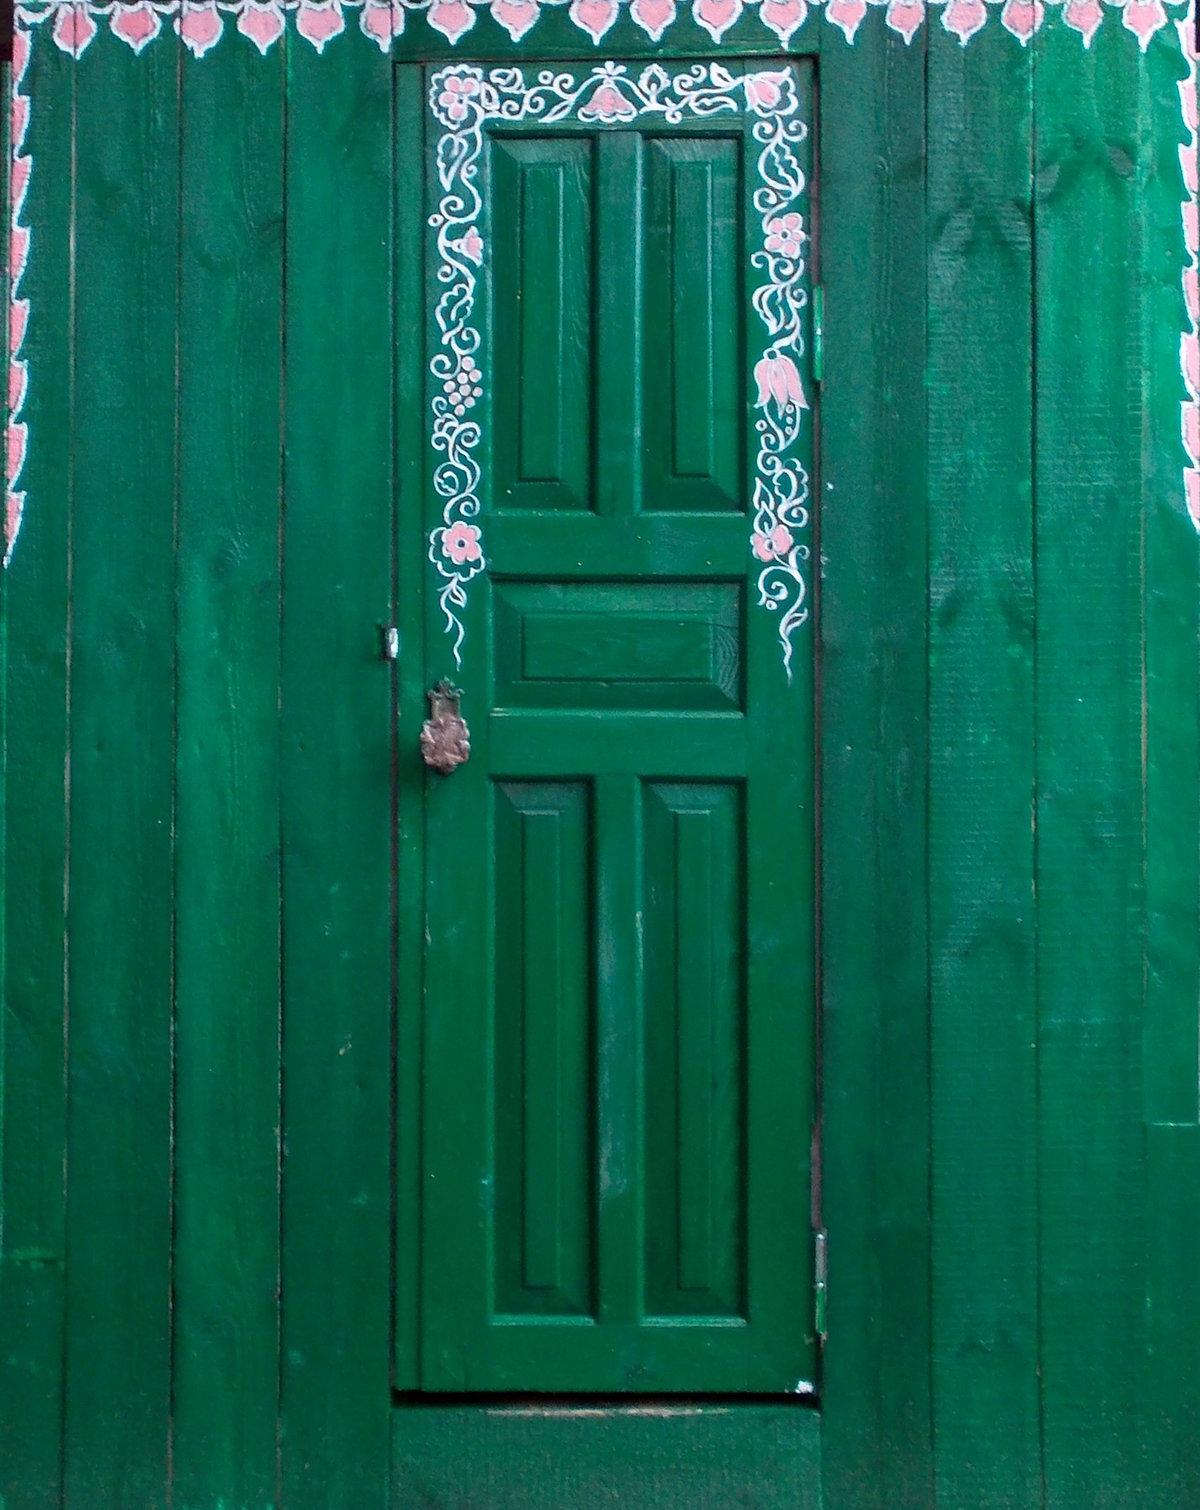 картинки двери деревенские луна символизирует